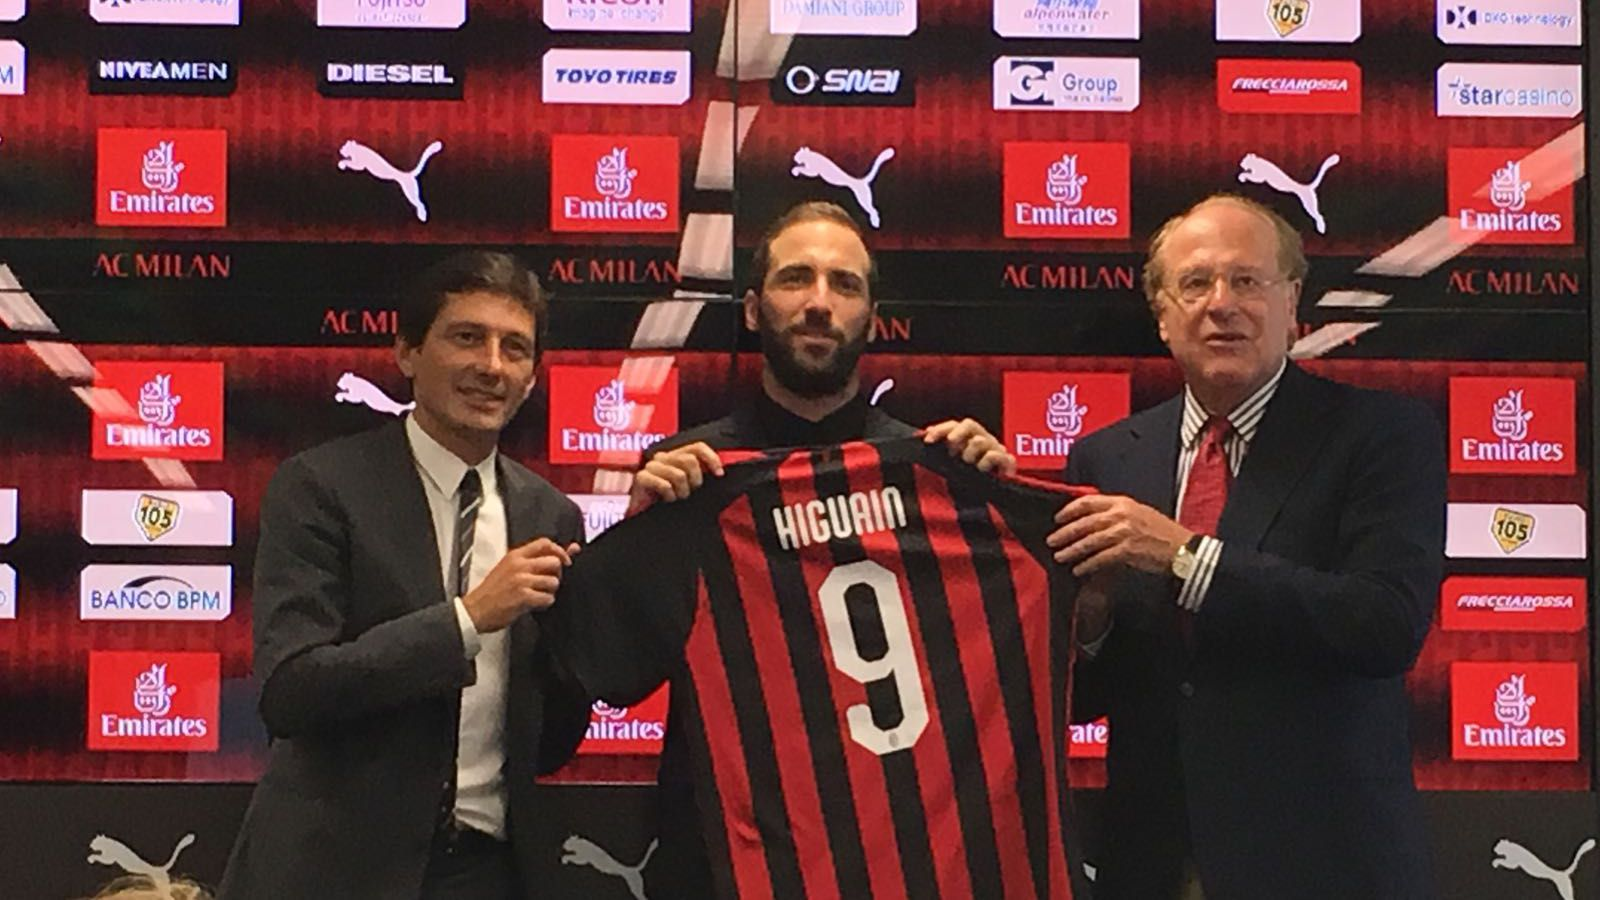 Higuain presentazione Milan